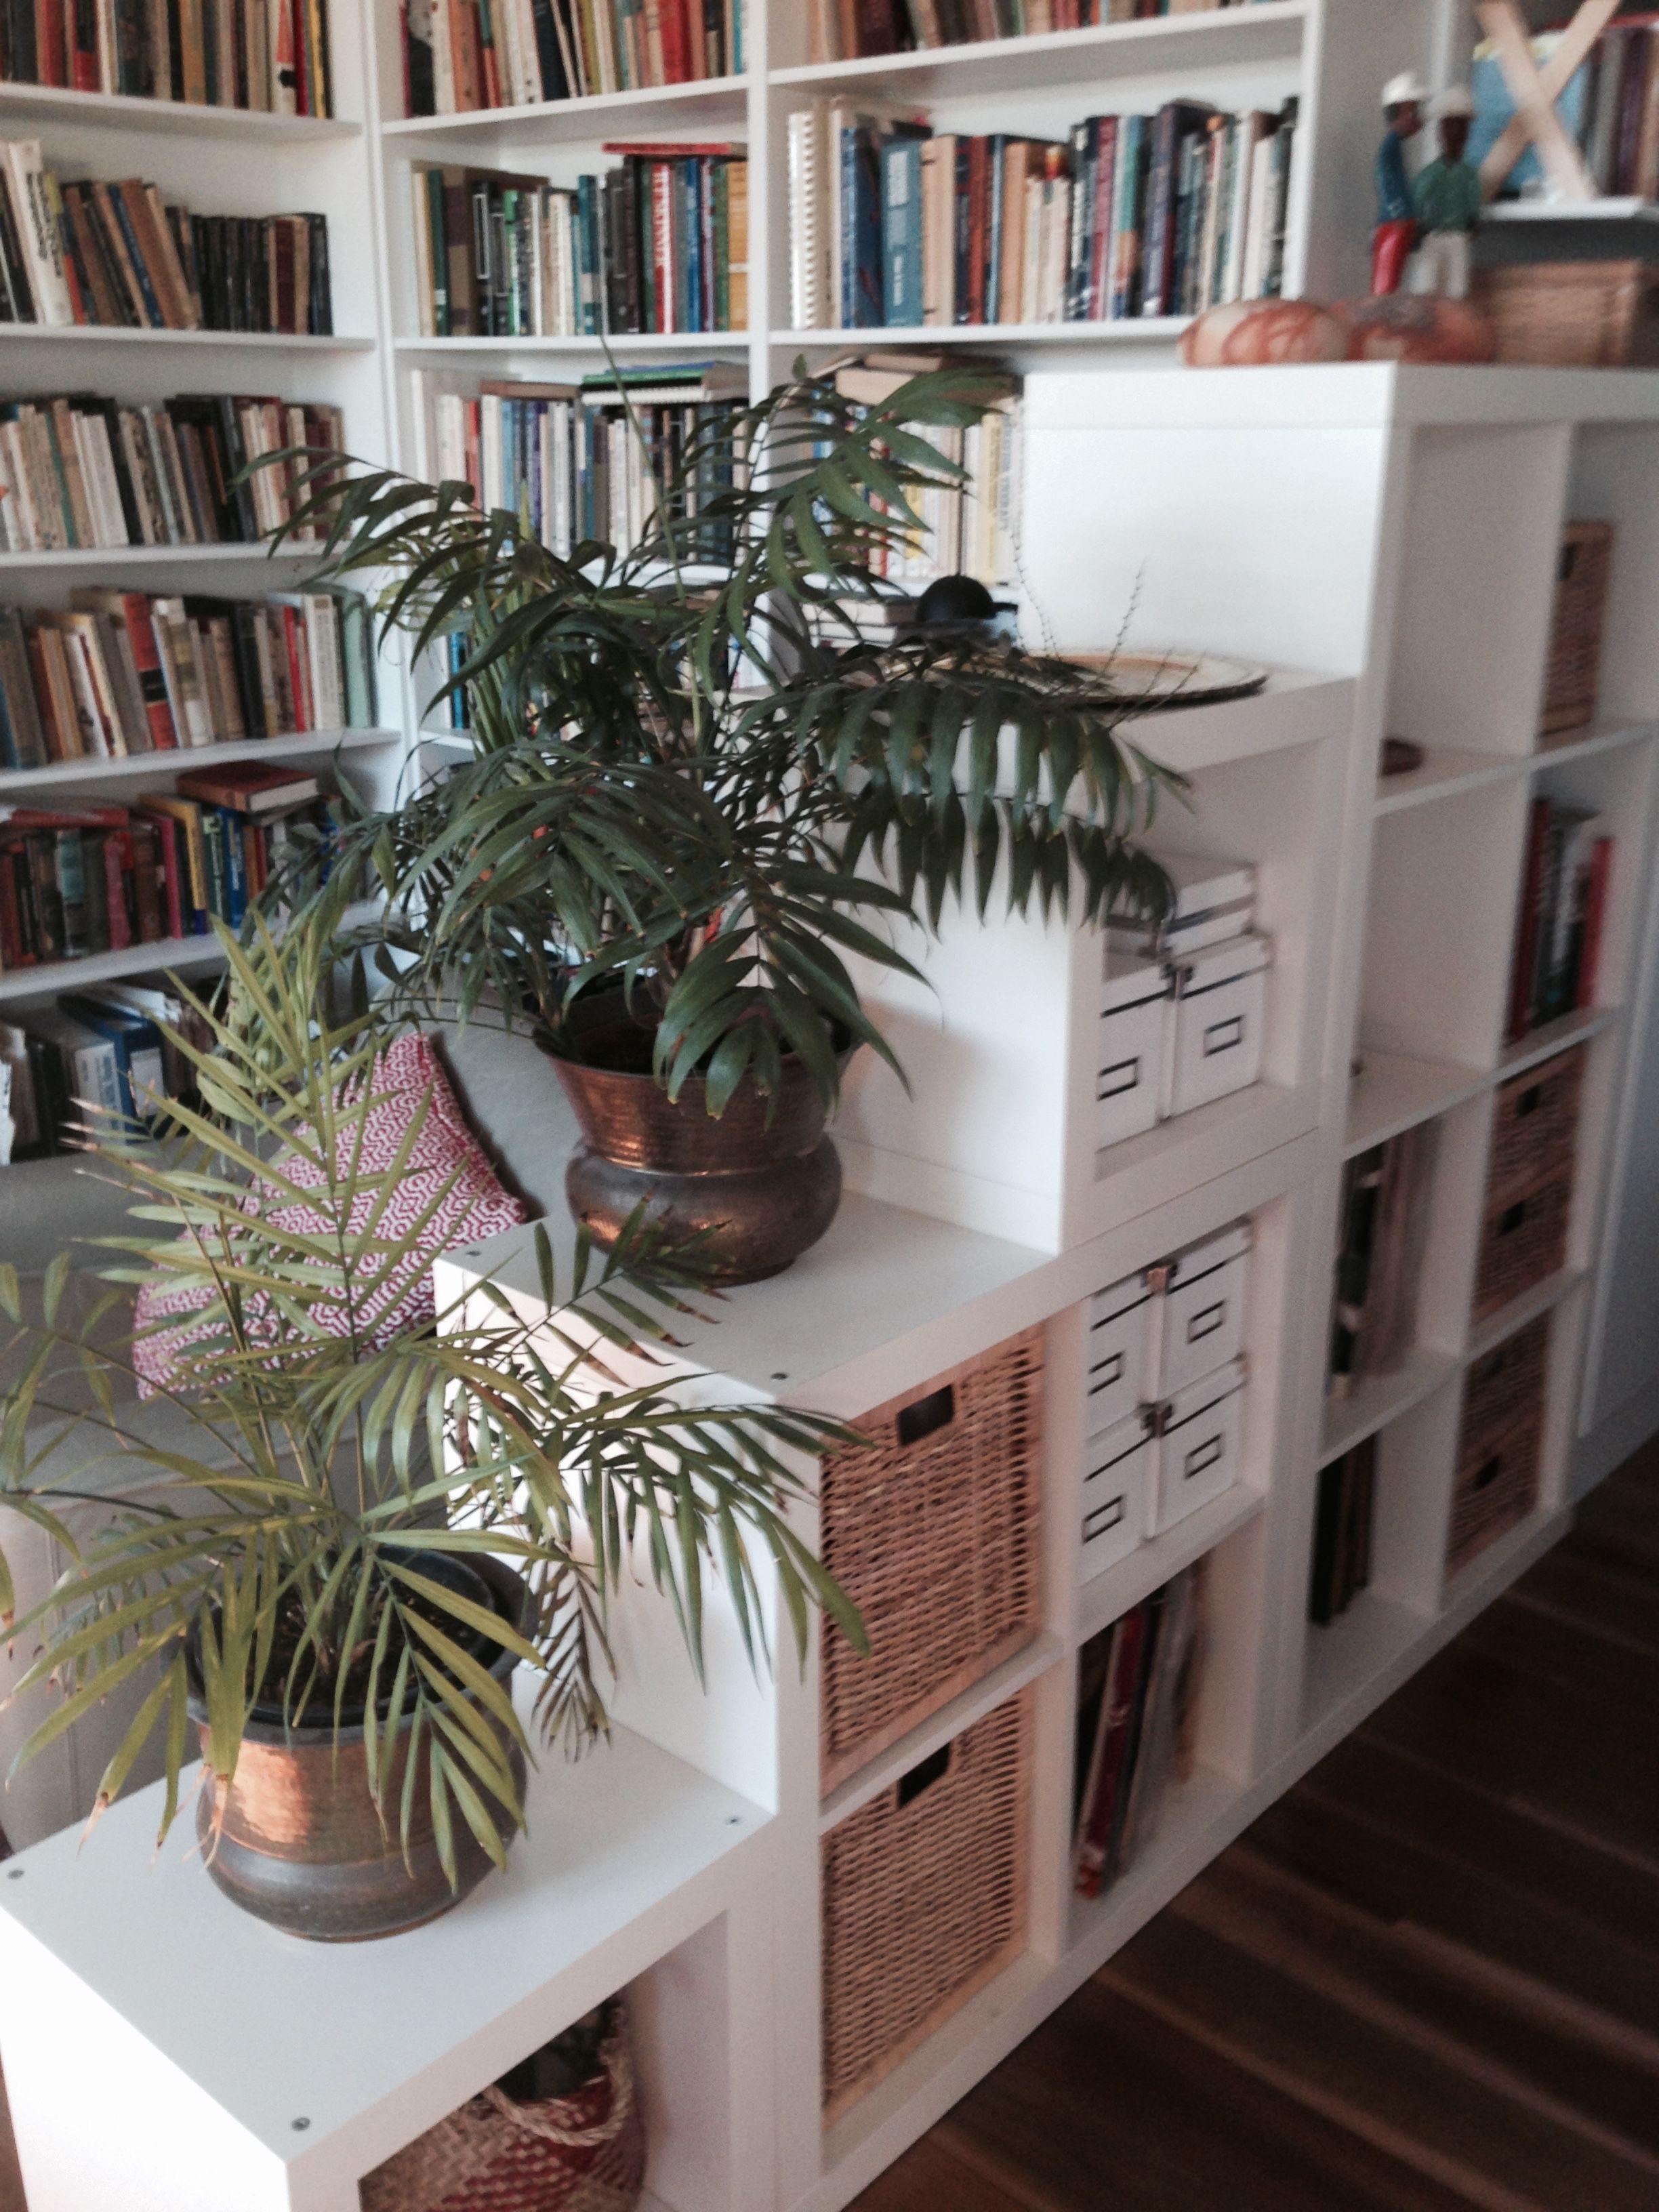 Expedit room divider in 2019 Ikea kallax bookshelf, Ikea